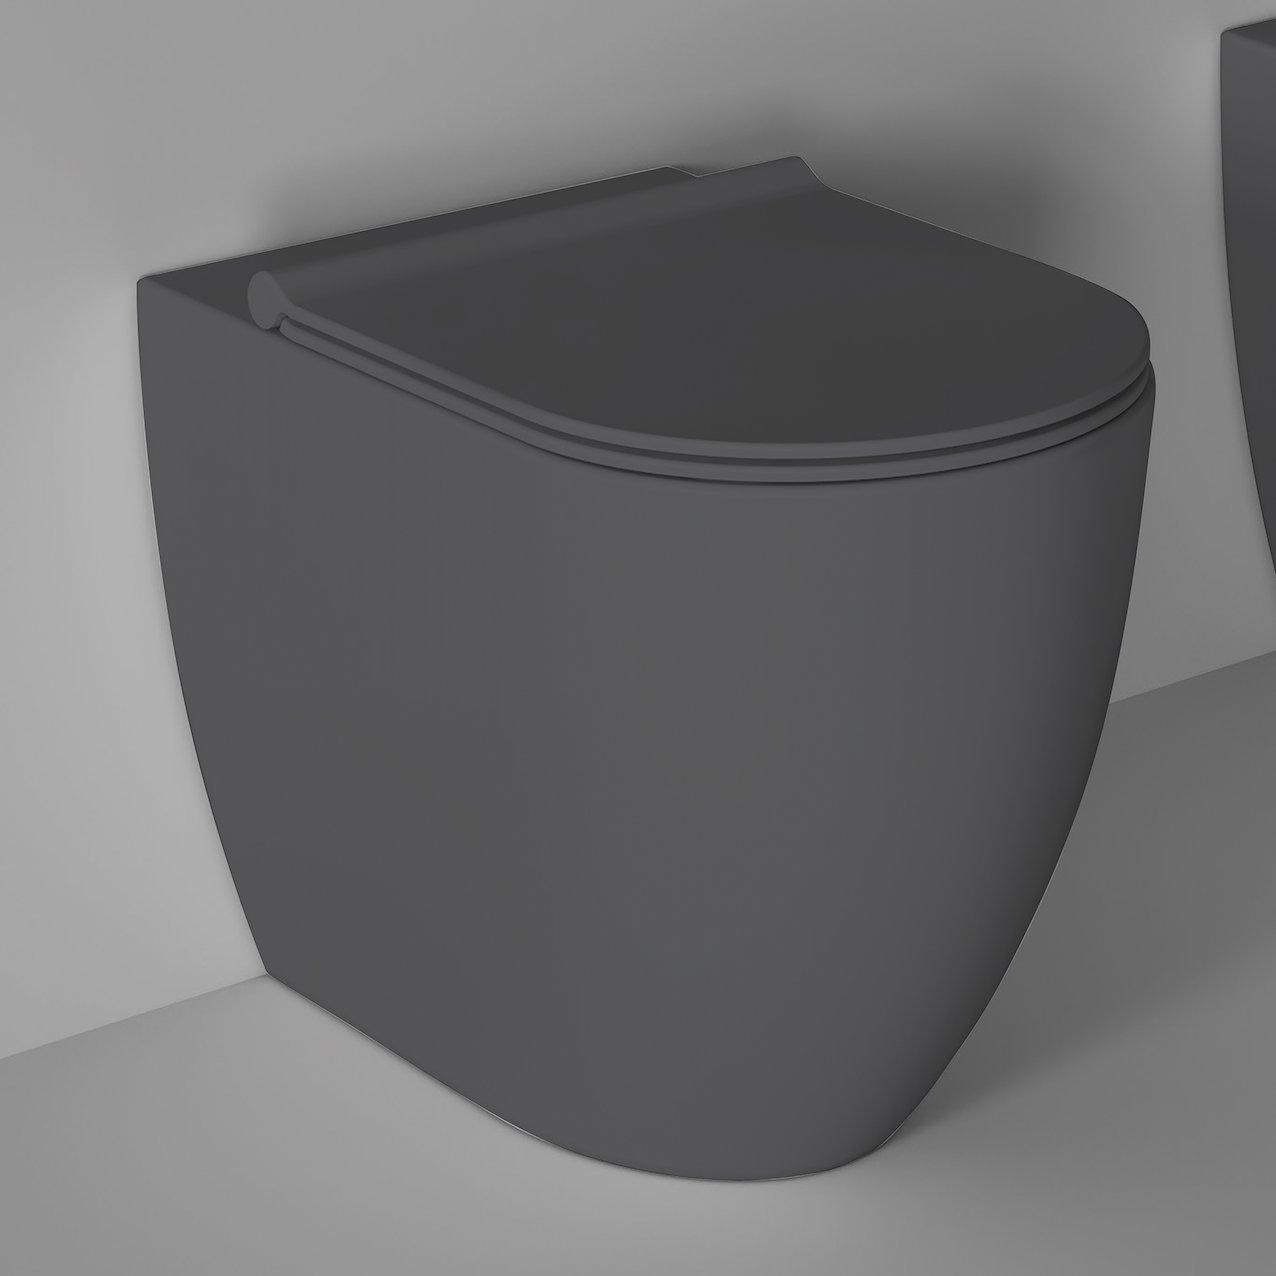 WC Form filomuro Traslato